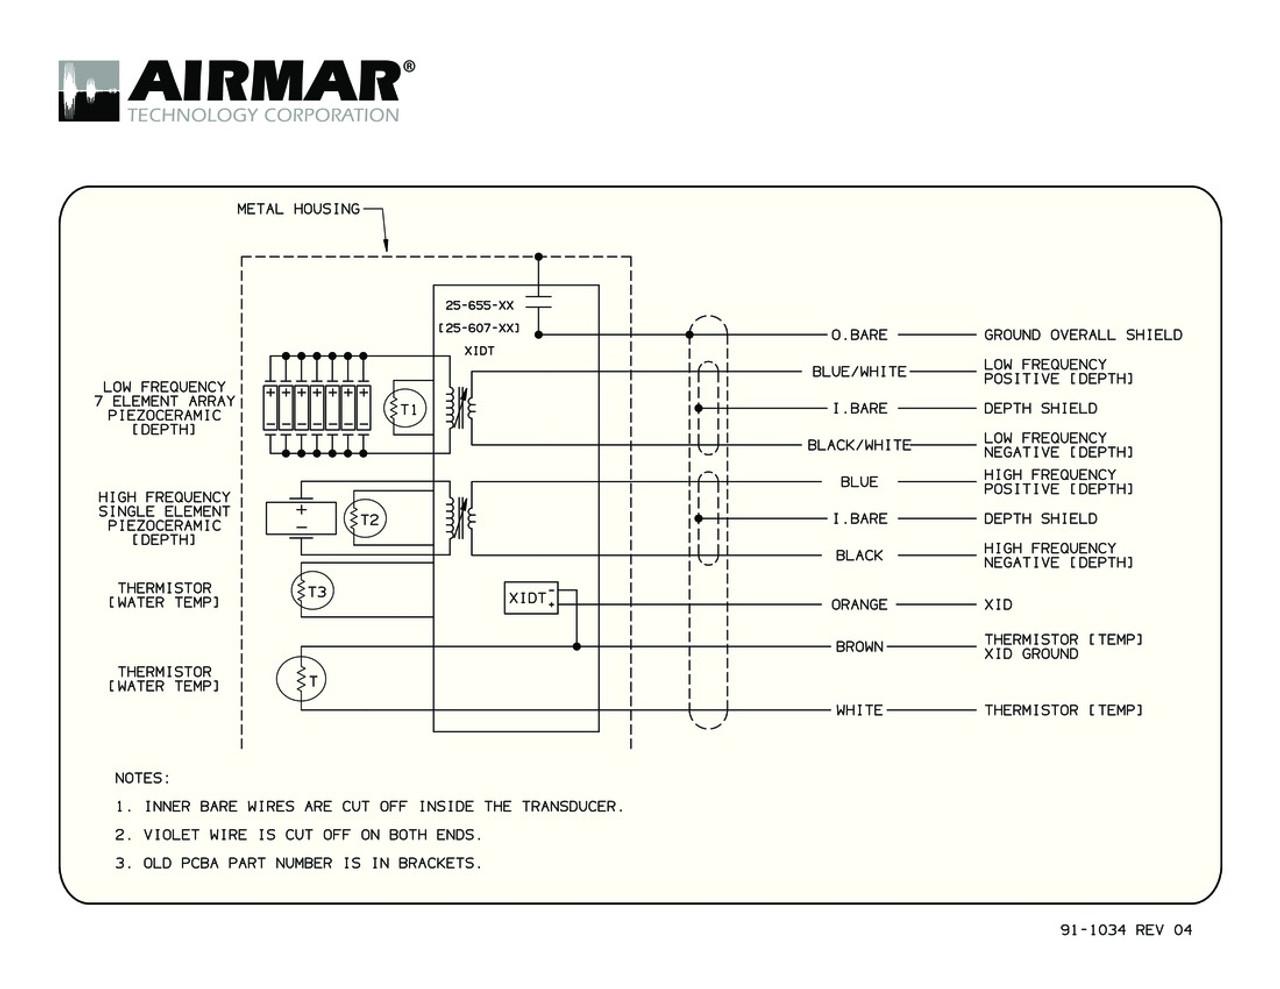 airmar wiring diagram b265 b275 blue bottle marine gm oxygen sensor wiring diagrams airmar wiring diagrams [ 1100 x 850 Pixel ]